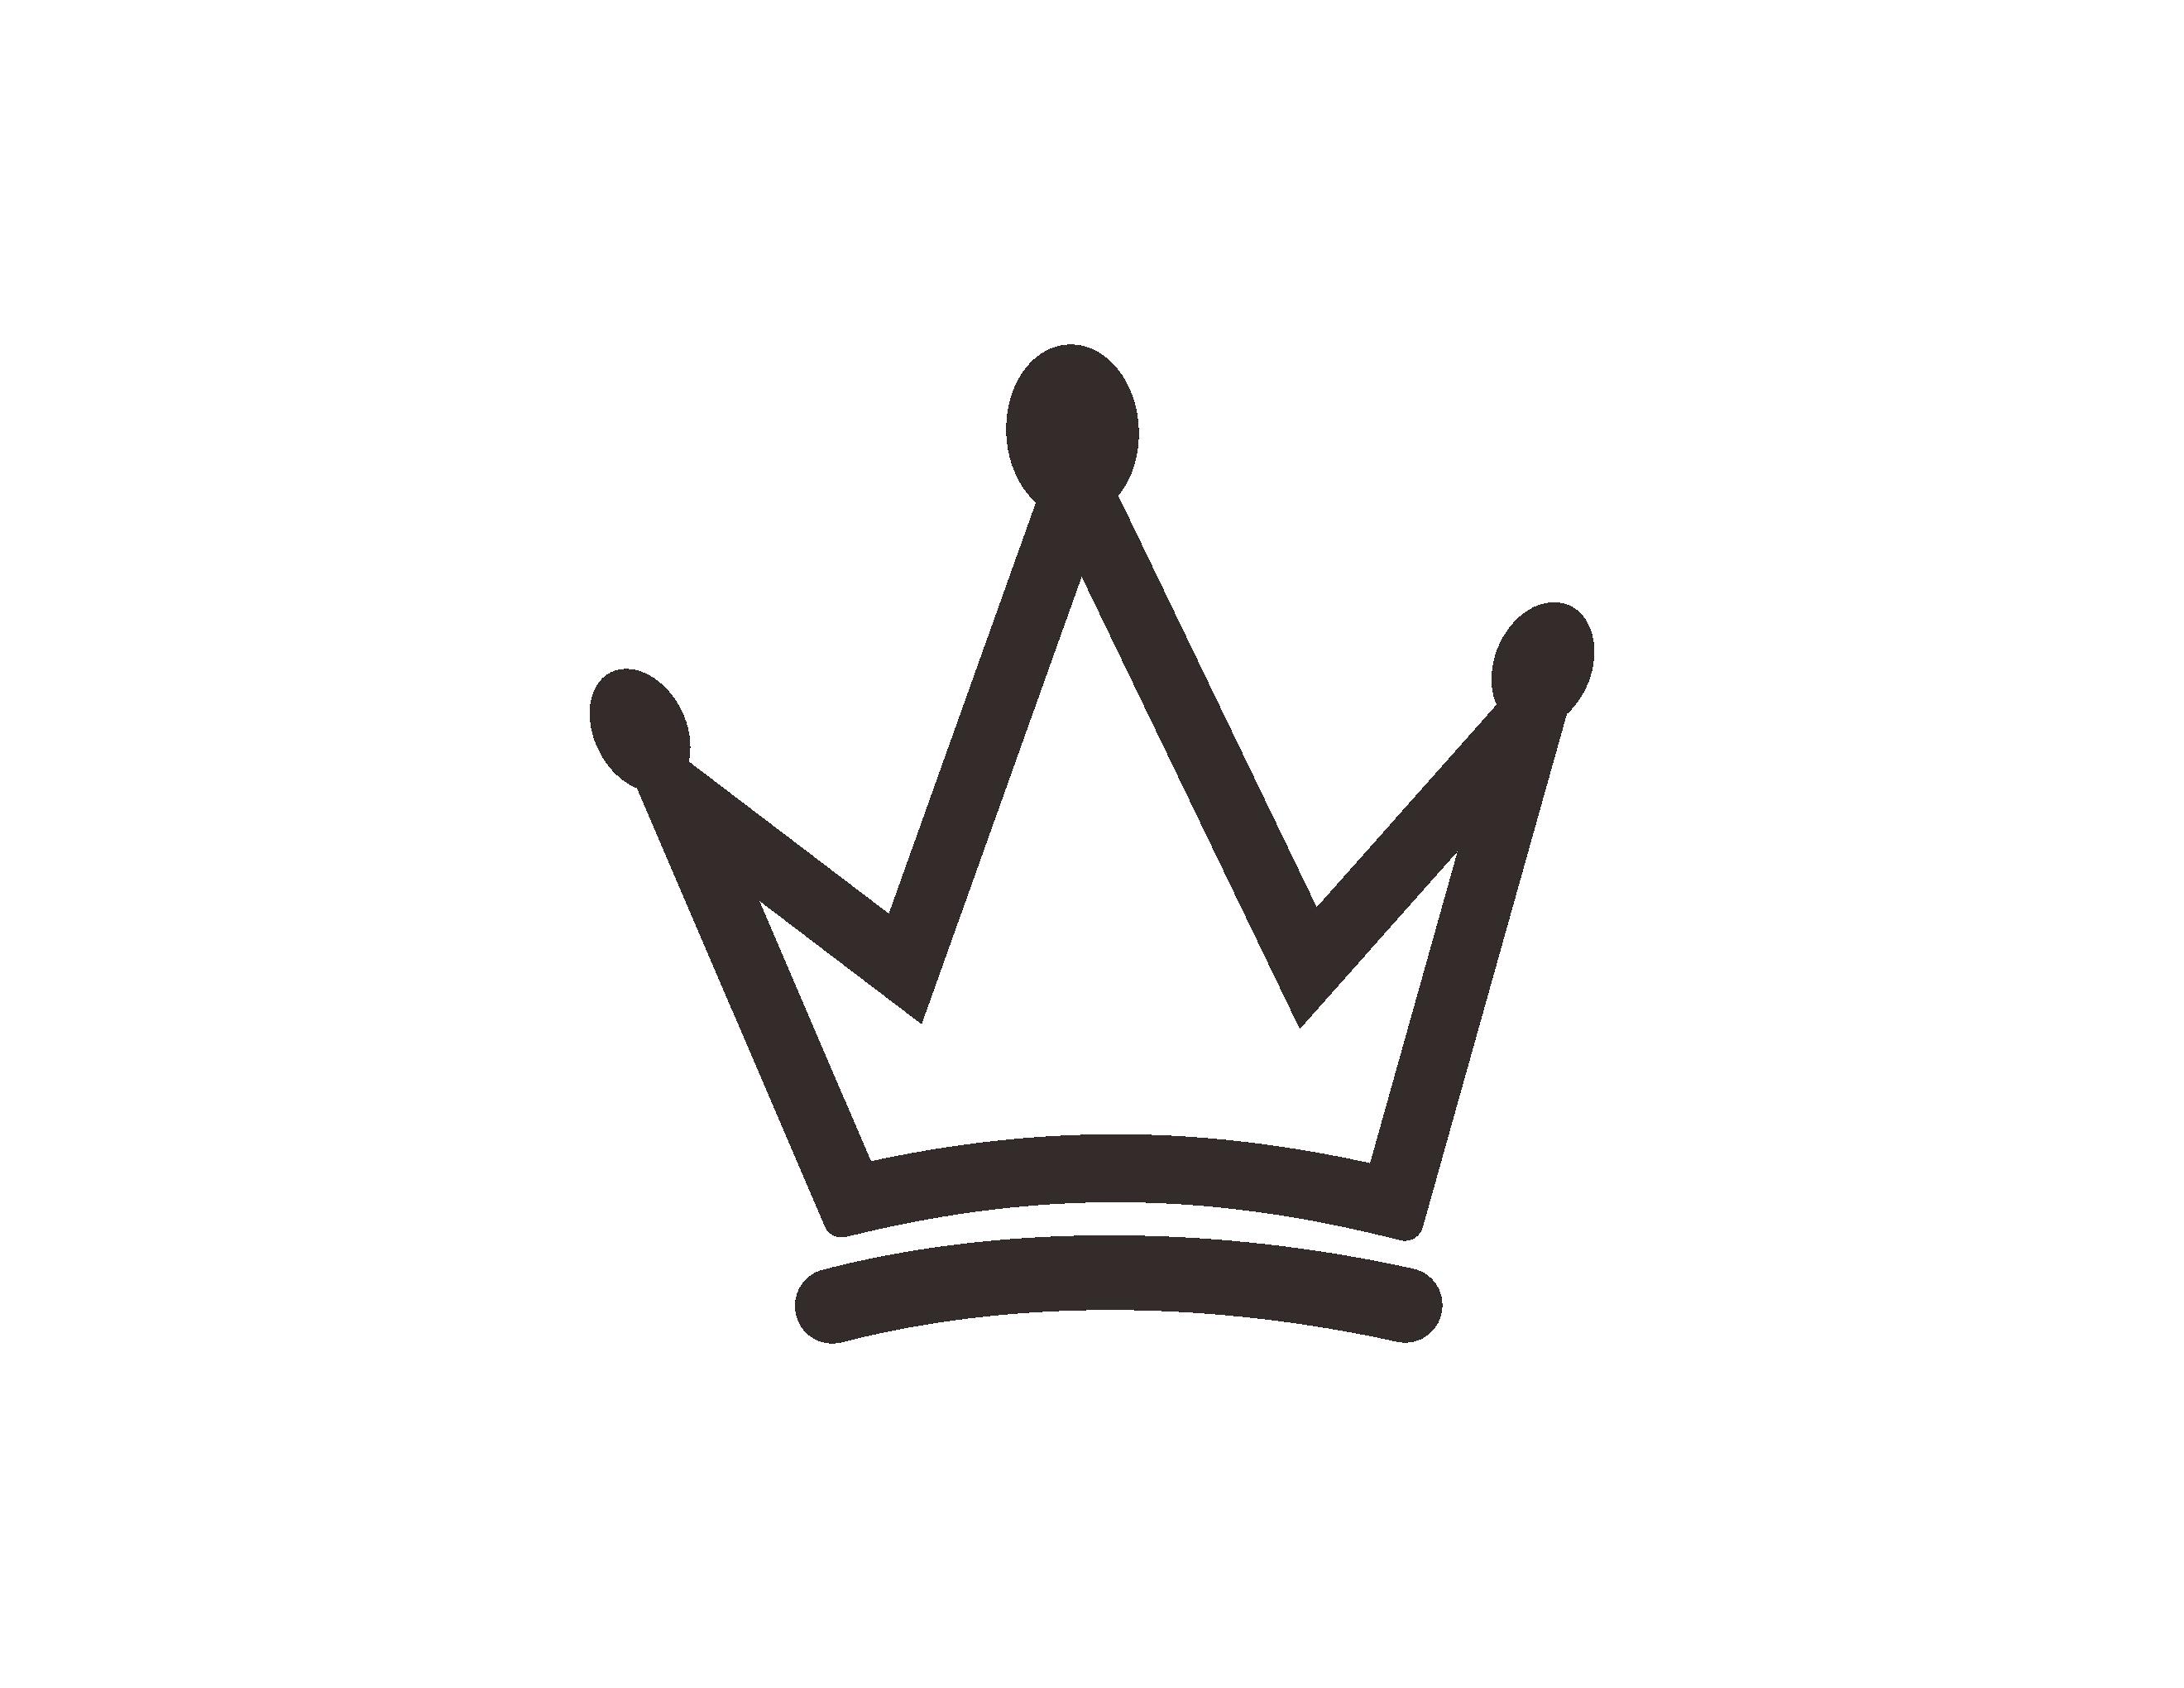 2640x2040 Black Crown Apparel